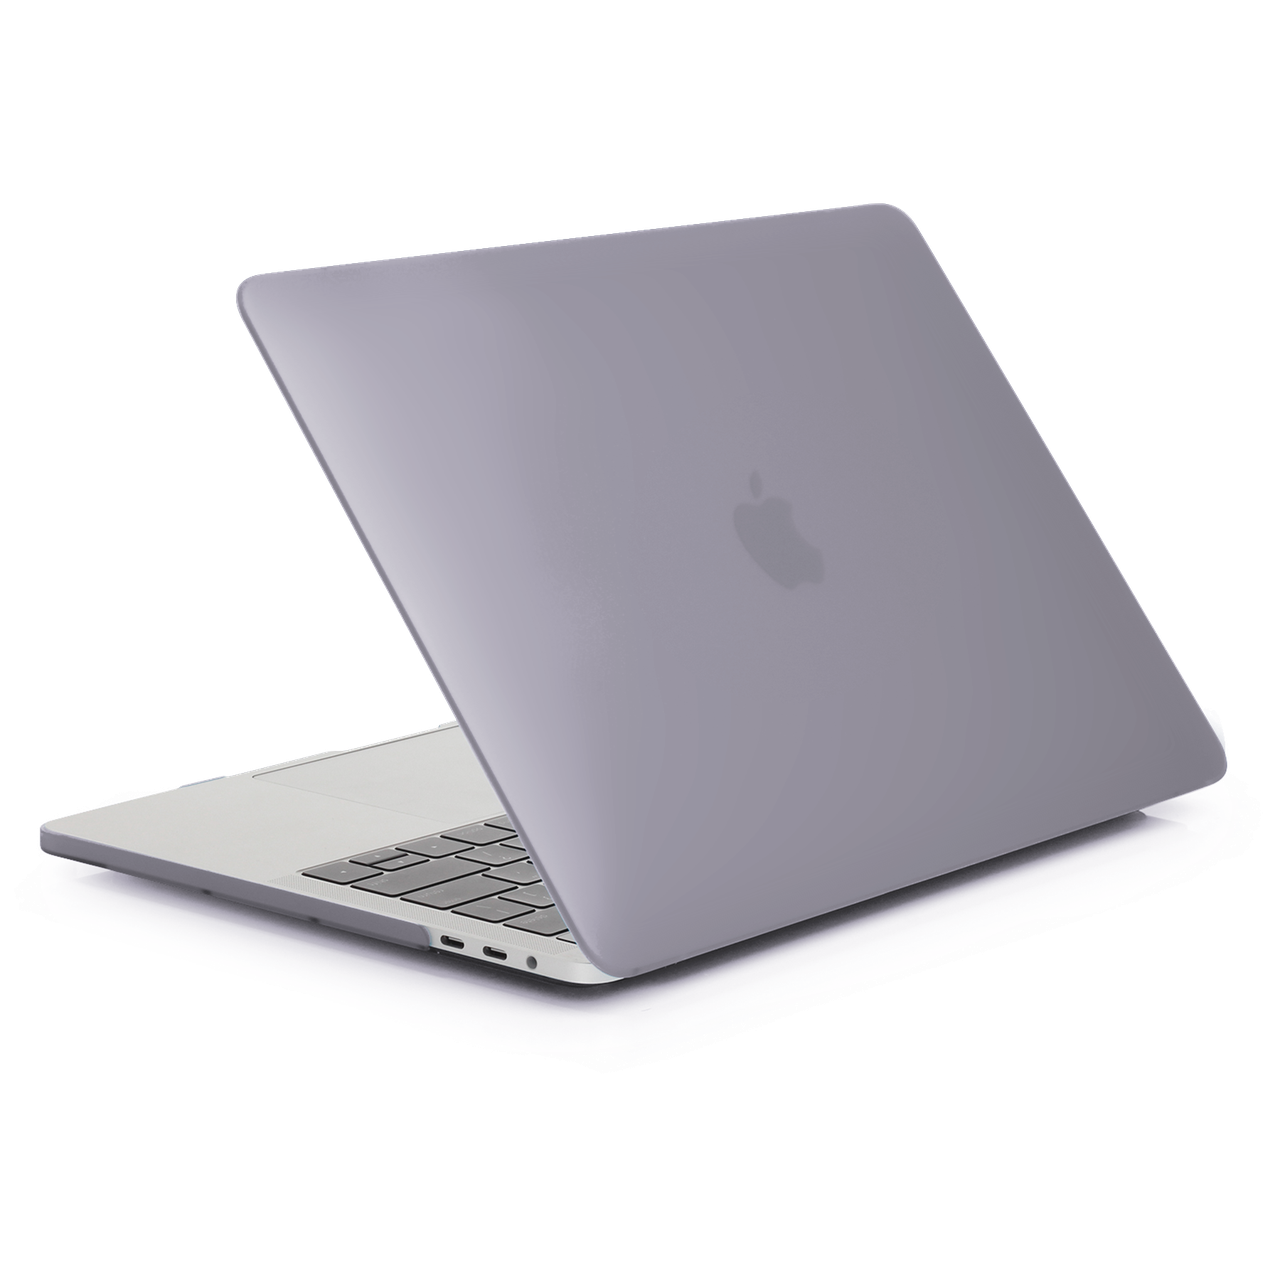 Macbook PNG images free download, apple macbook PNG.